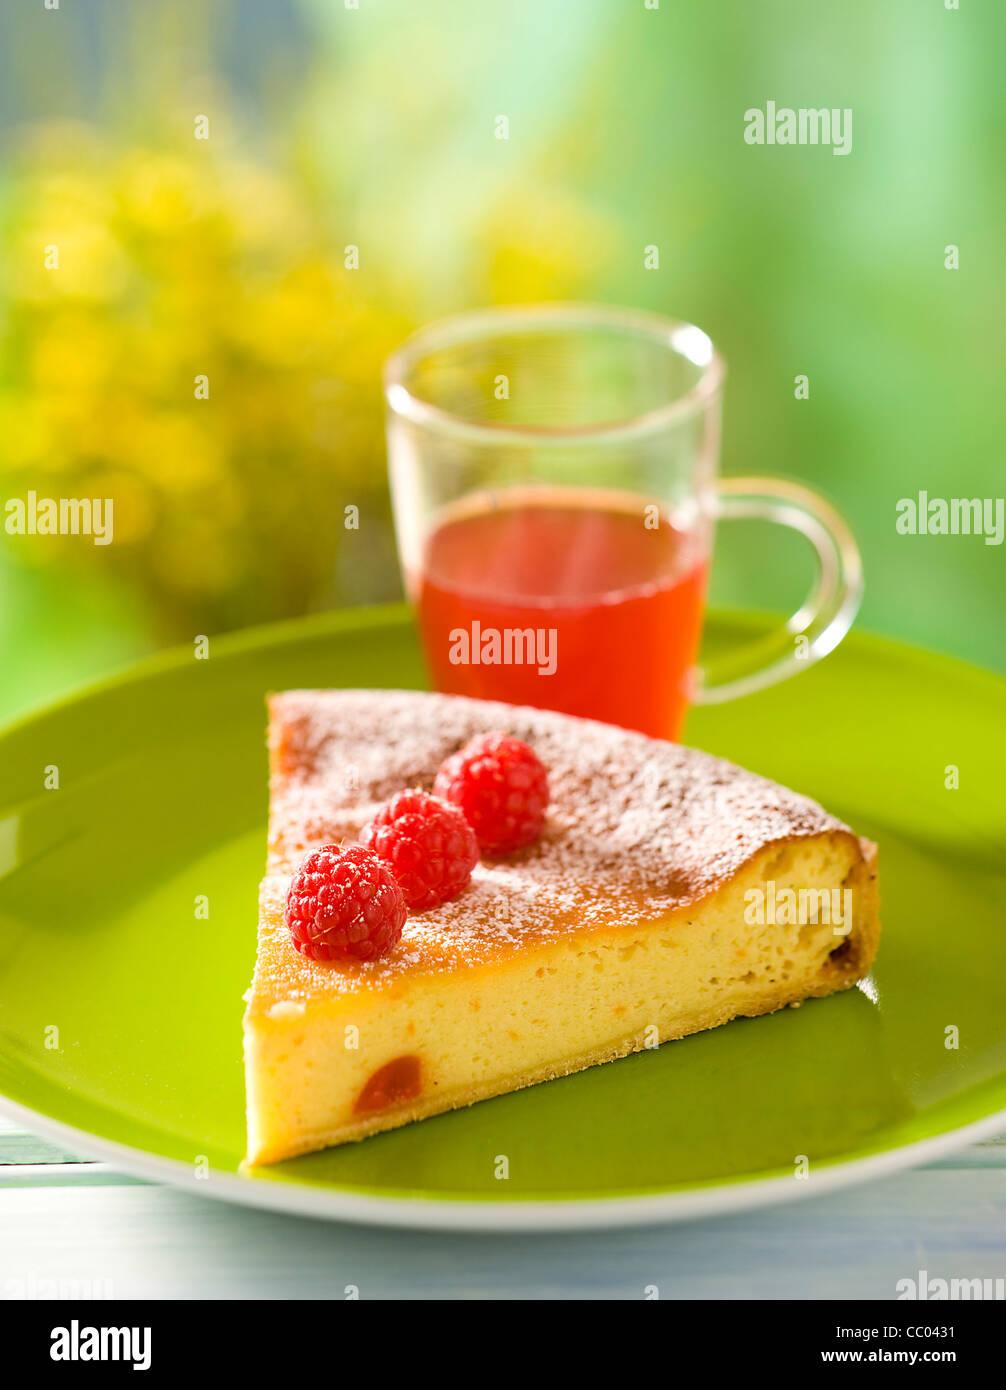 Ricotta and Raspberry Pie - Stock Image